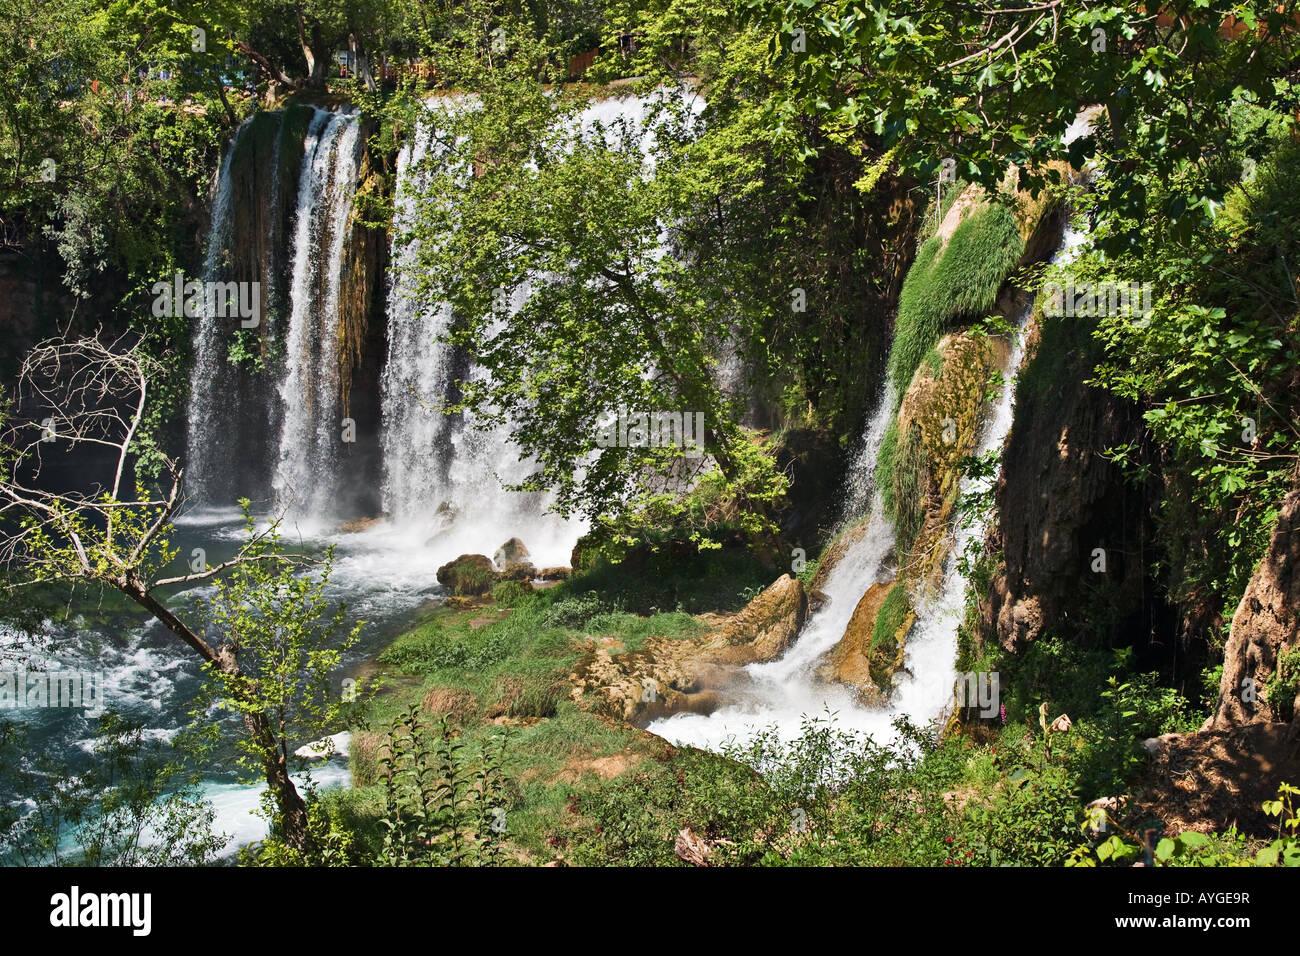 Dudan waterfall in Antalya, Turkey - Stock Image